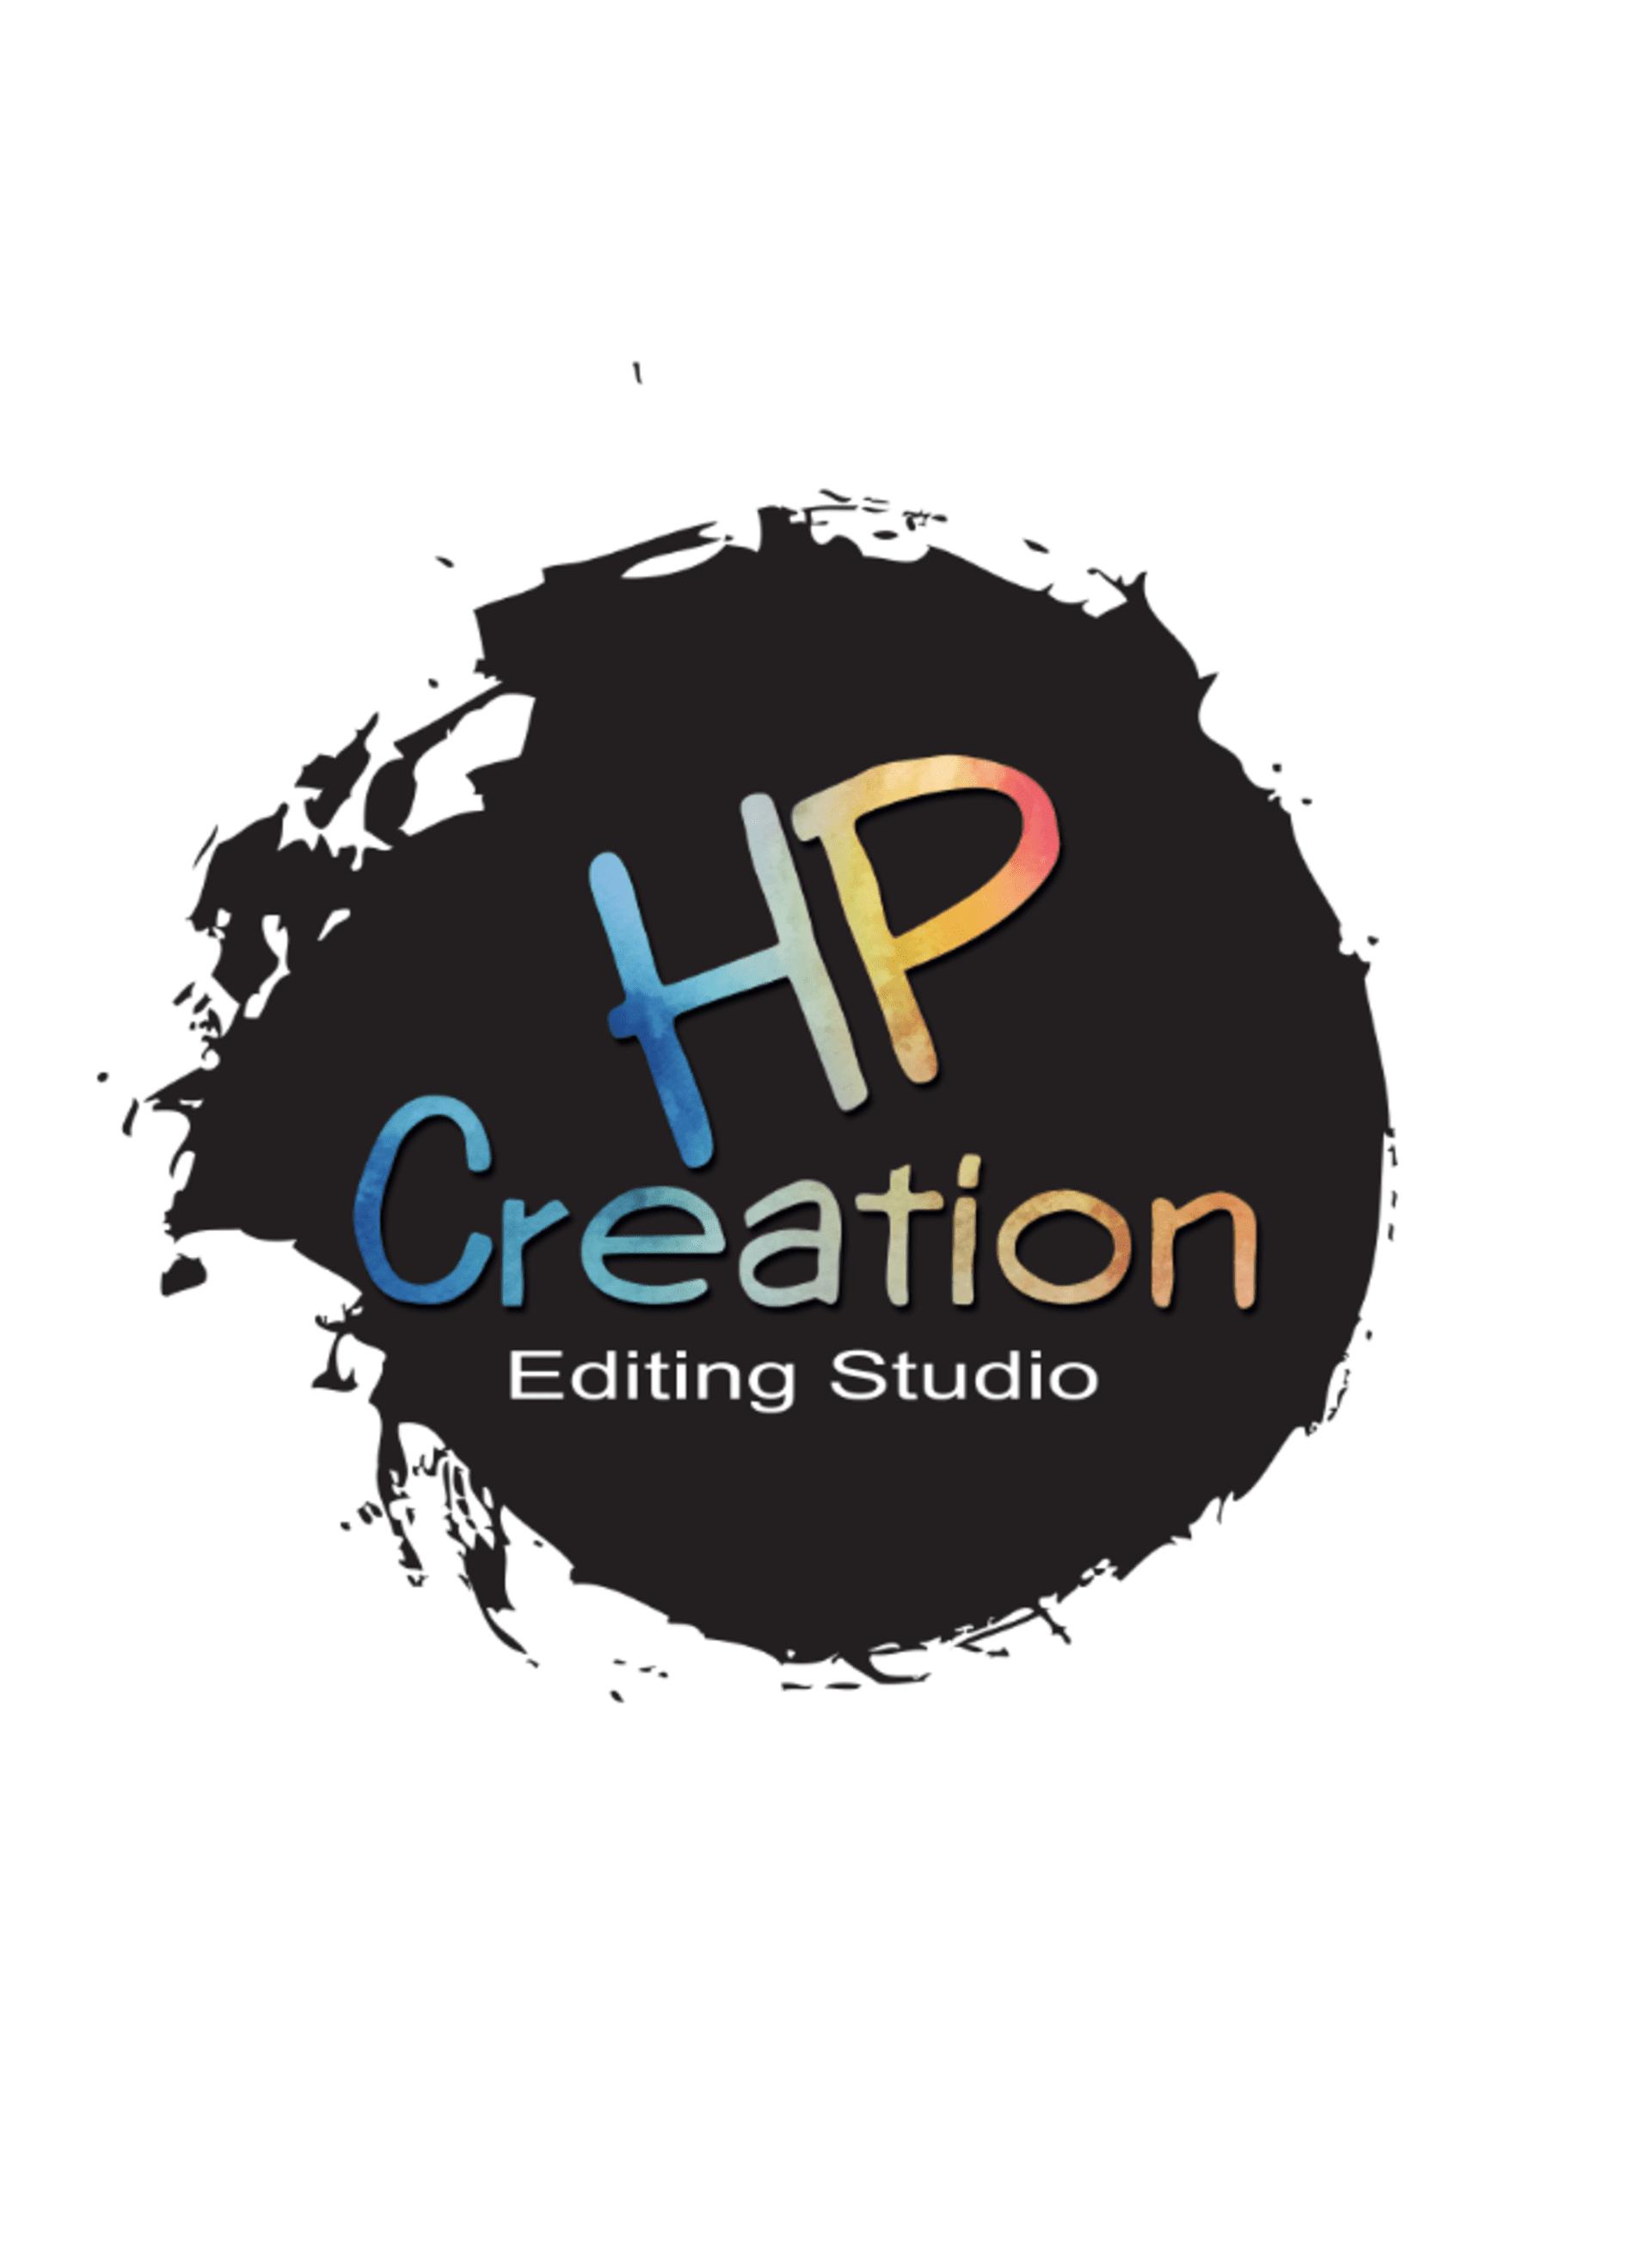 Hp Creation Editing Studio